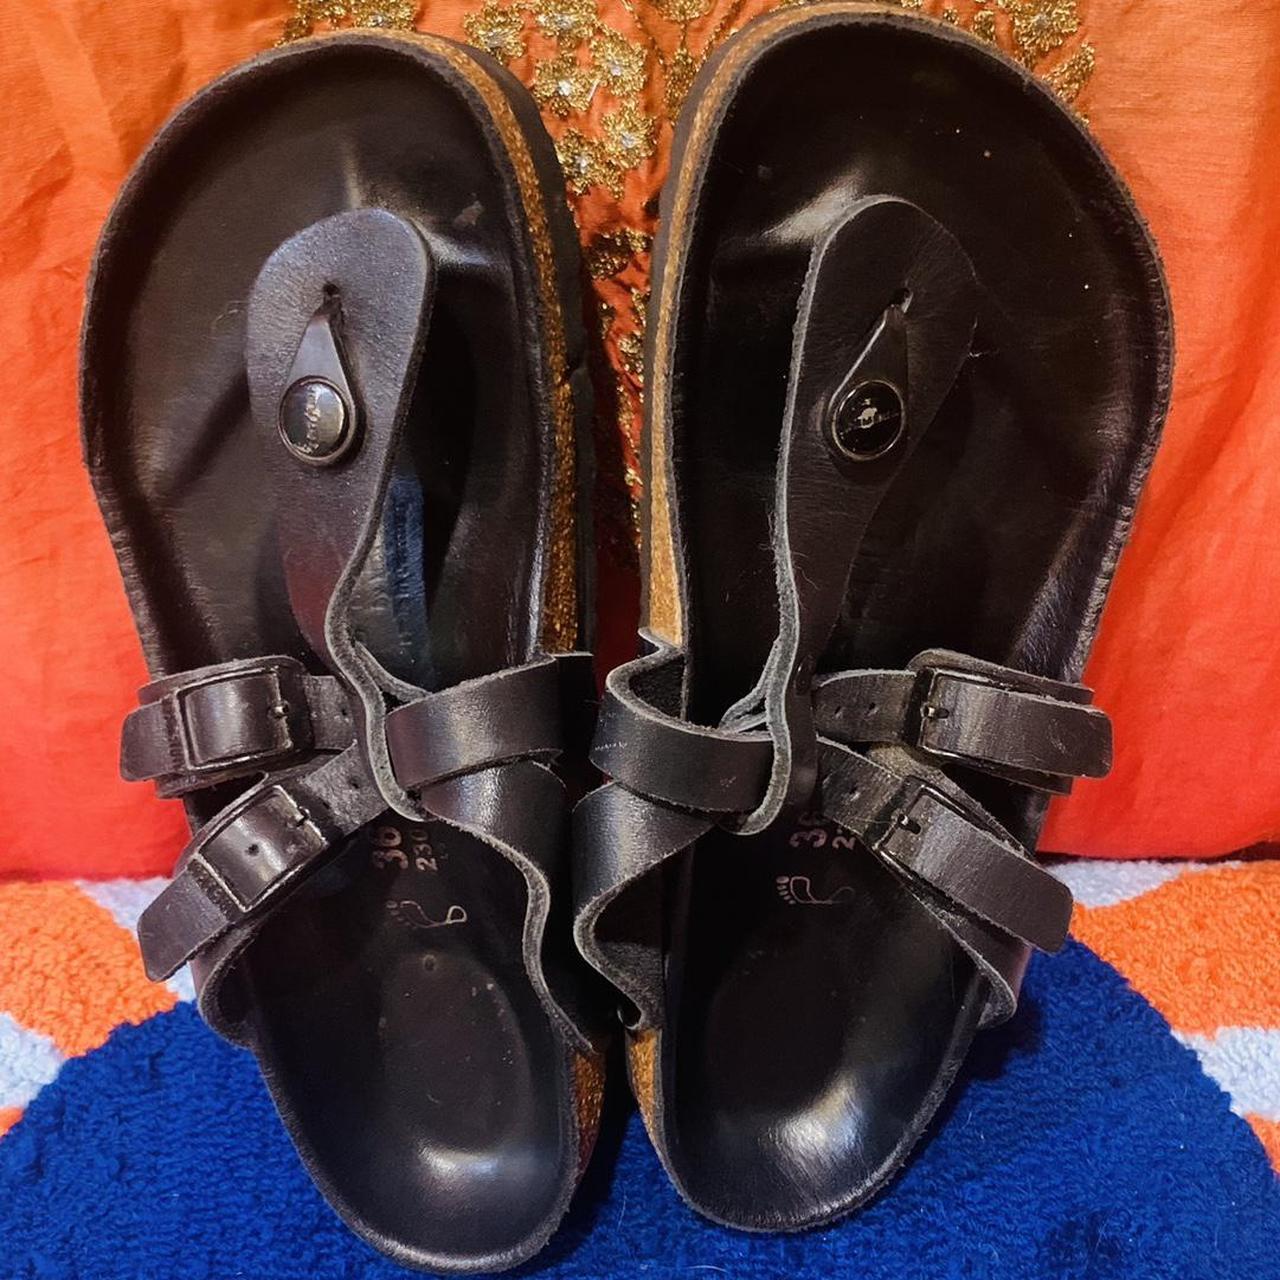 Product Image 1 - Birkenstock Tatami Black Leather Sandals